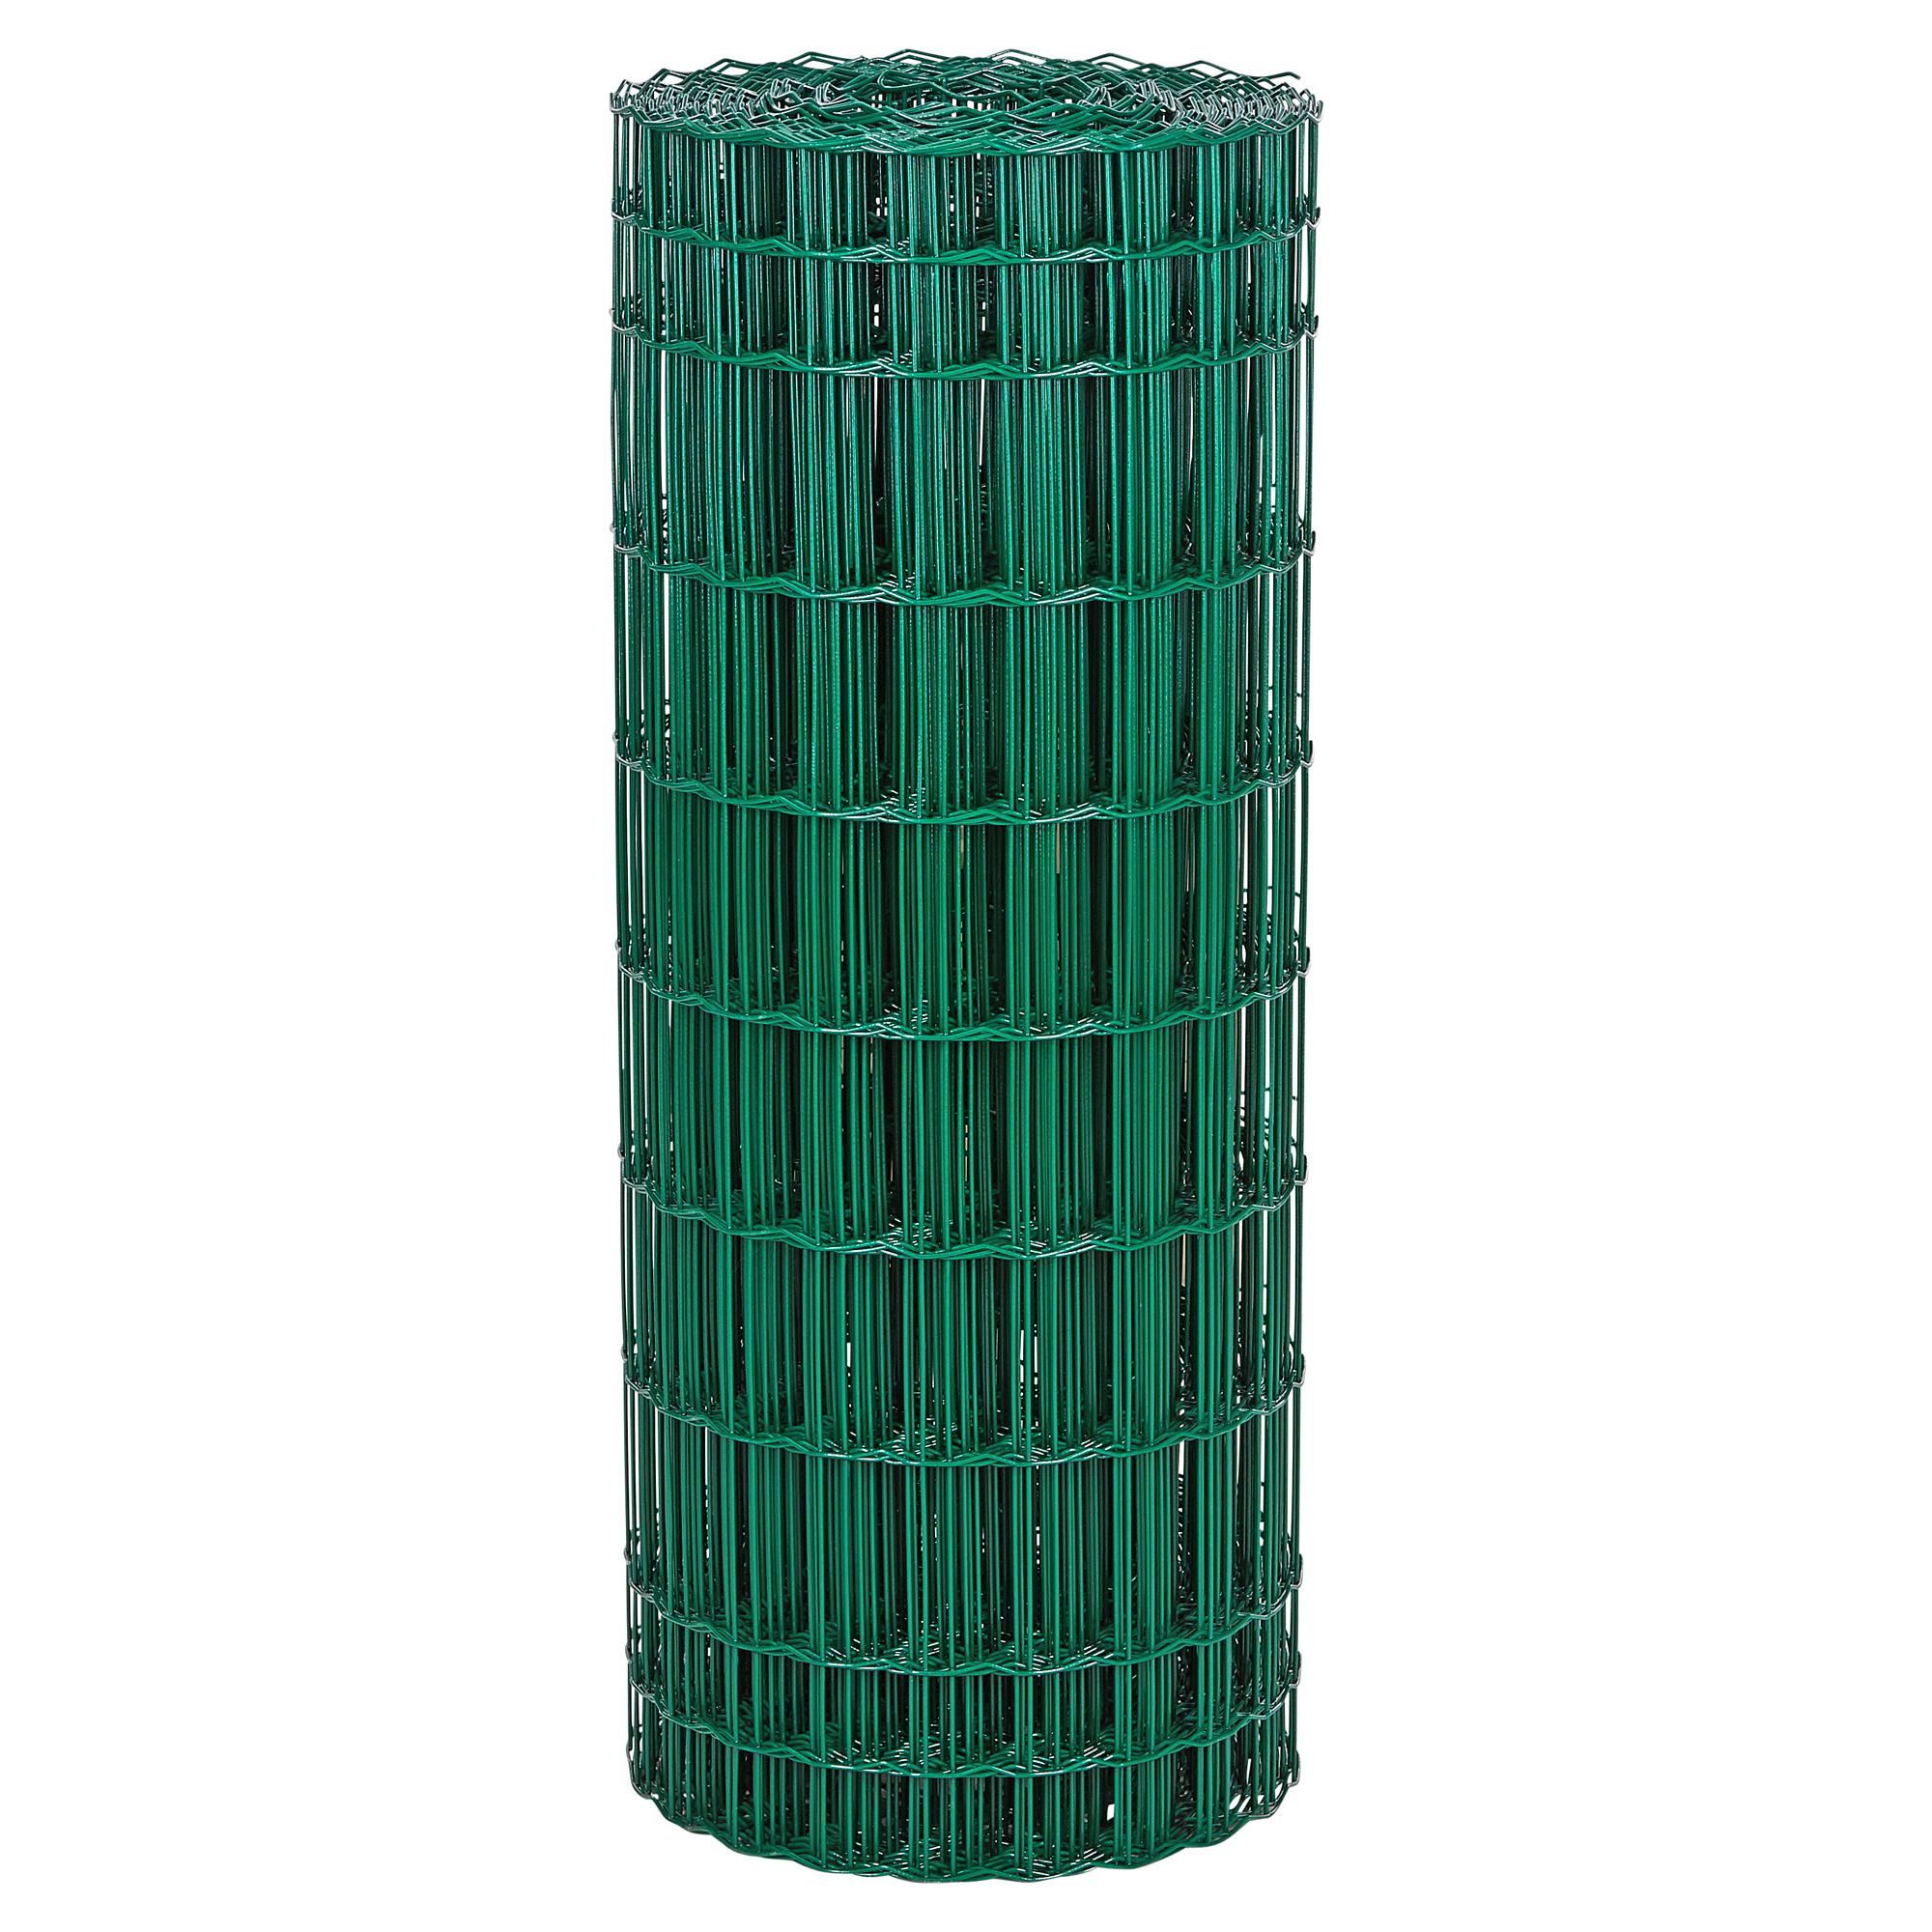 Zaun Jaditor Eisen Kunststoff Grun 2500 X 80 Cm ǀ Toom Baumarkt